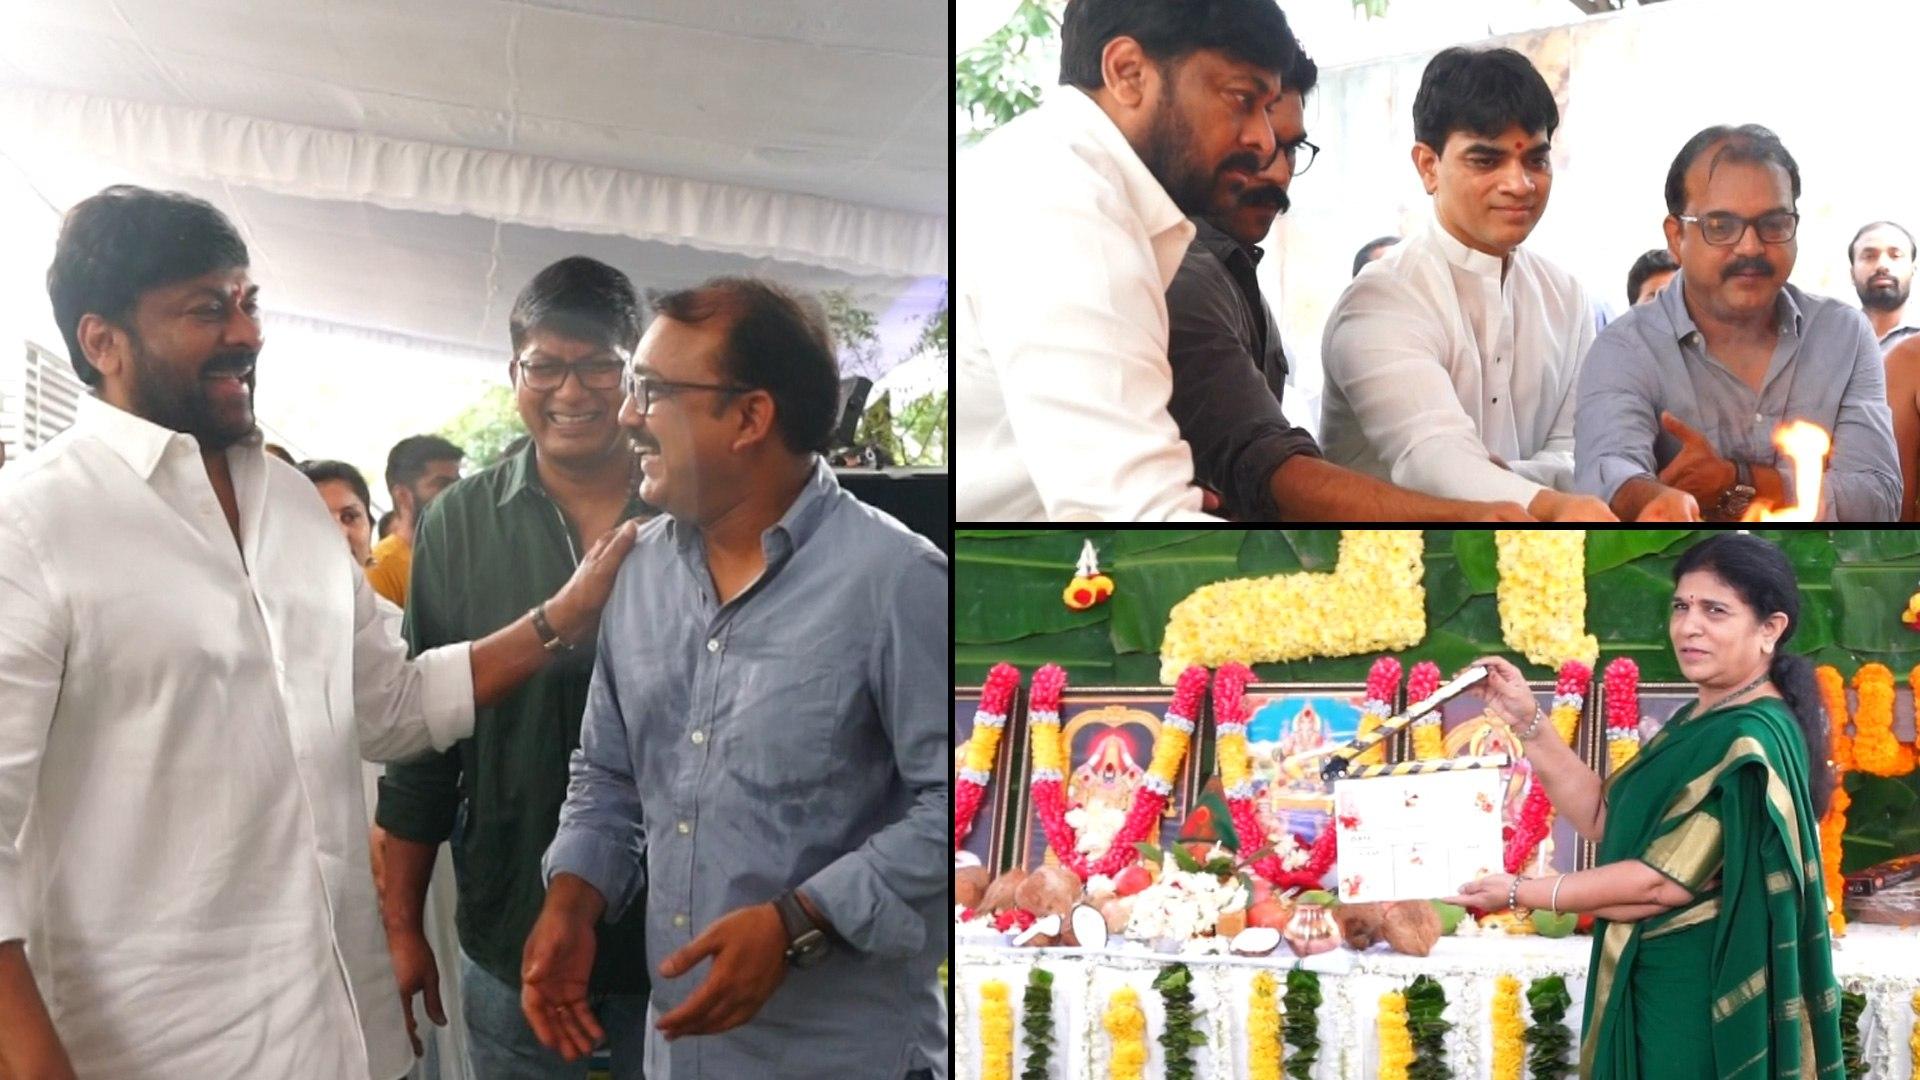 Chiru 152 : Chiranjeevi 152 Movie Launched    చిరంజీవి 152వ సినిమా లాంఛ్ వీడియో